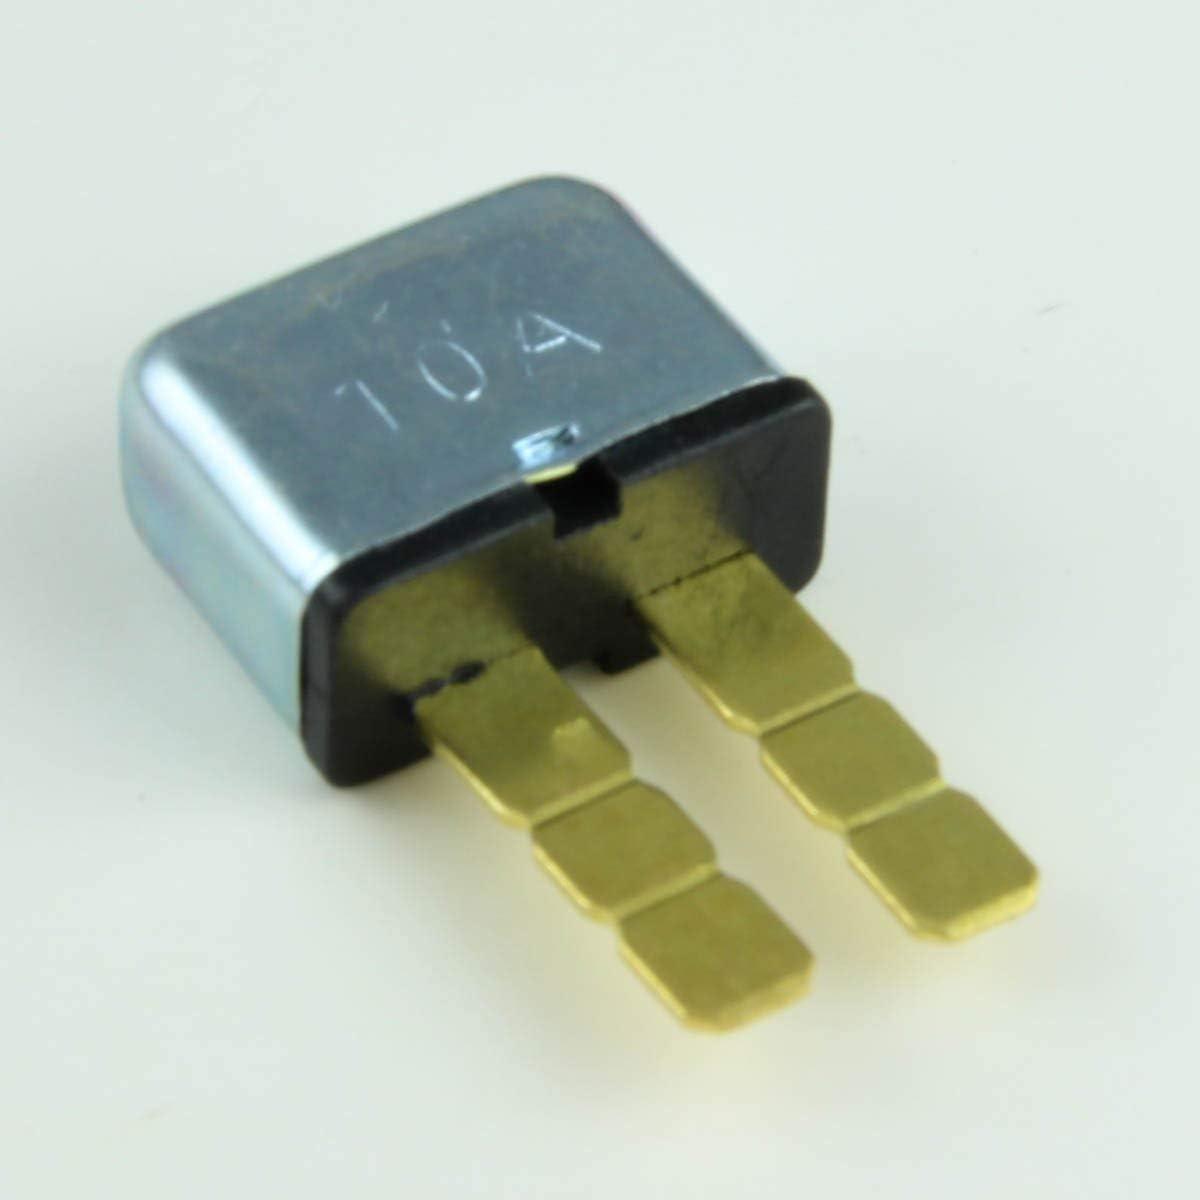 10 AMP Mini Fuse Blade Reset Circuit Breaker 12V 1